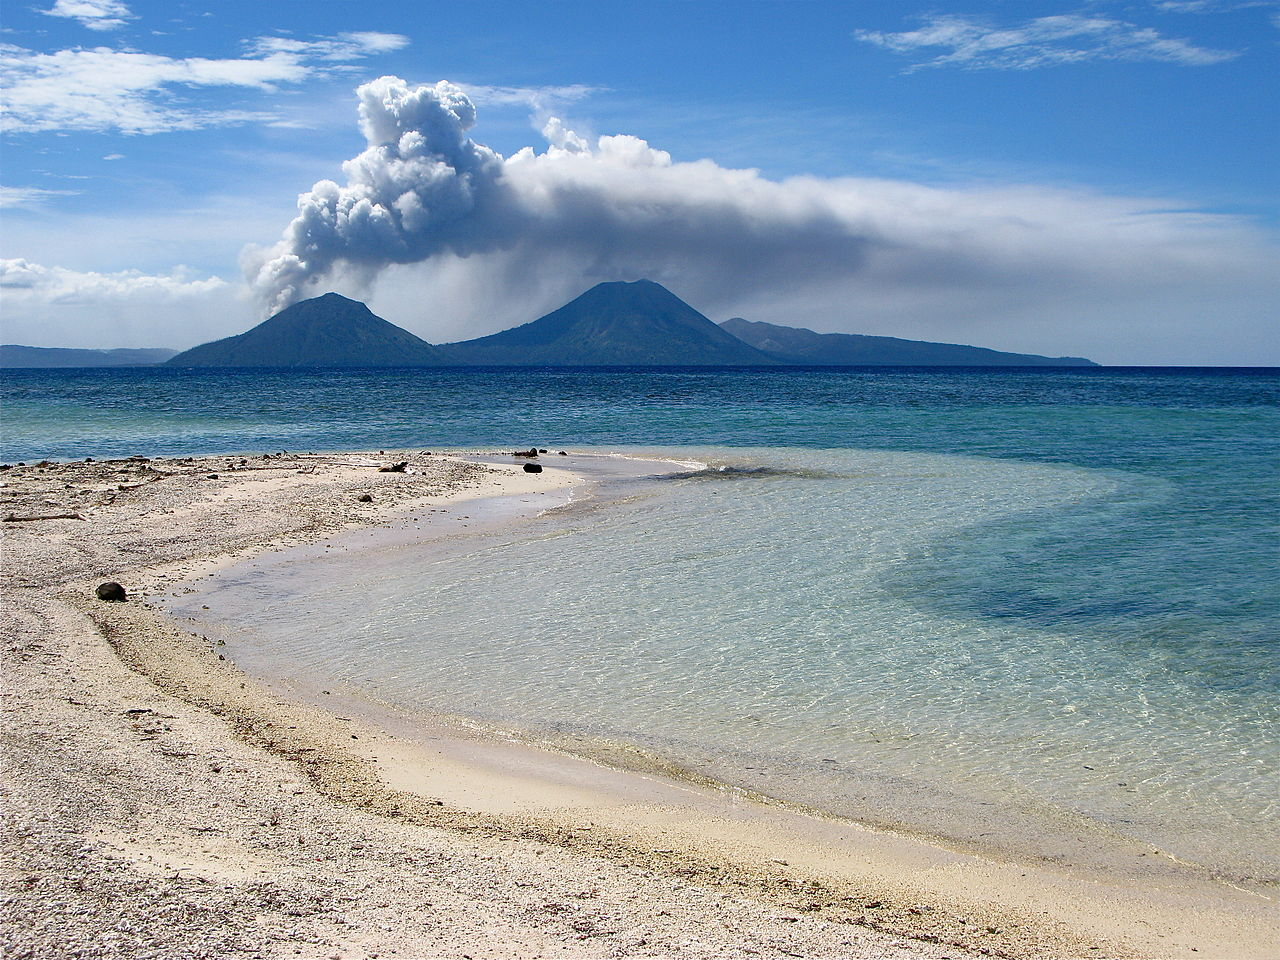 File:Sun, Sea, Sand And Volcano.jpg - Wikimedia Commons